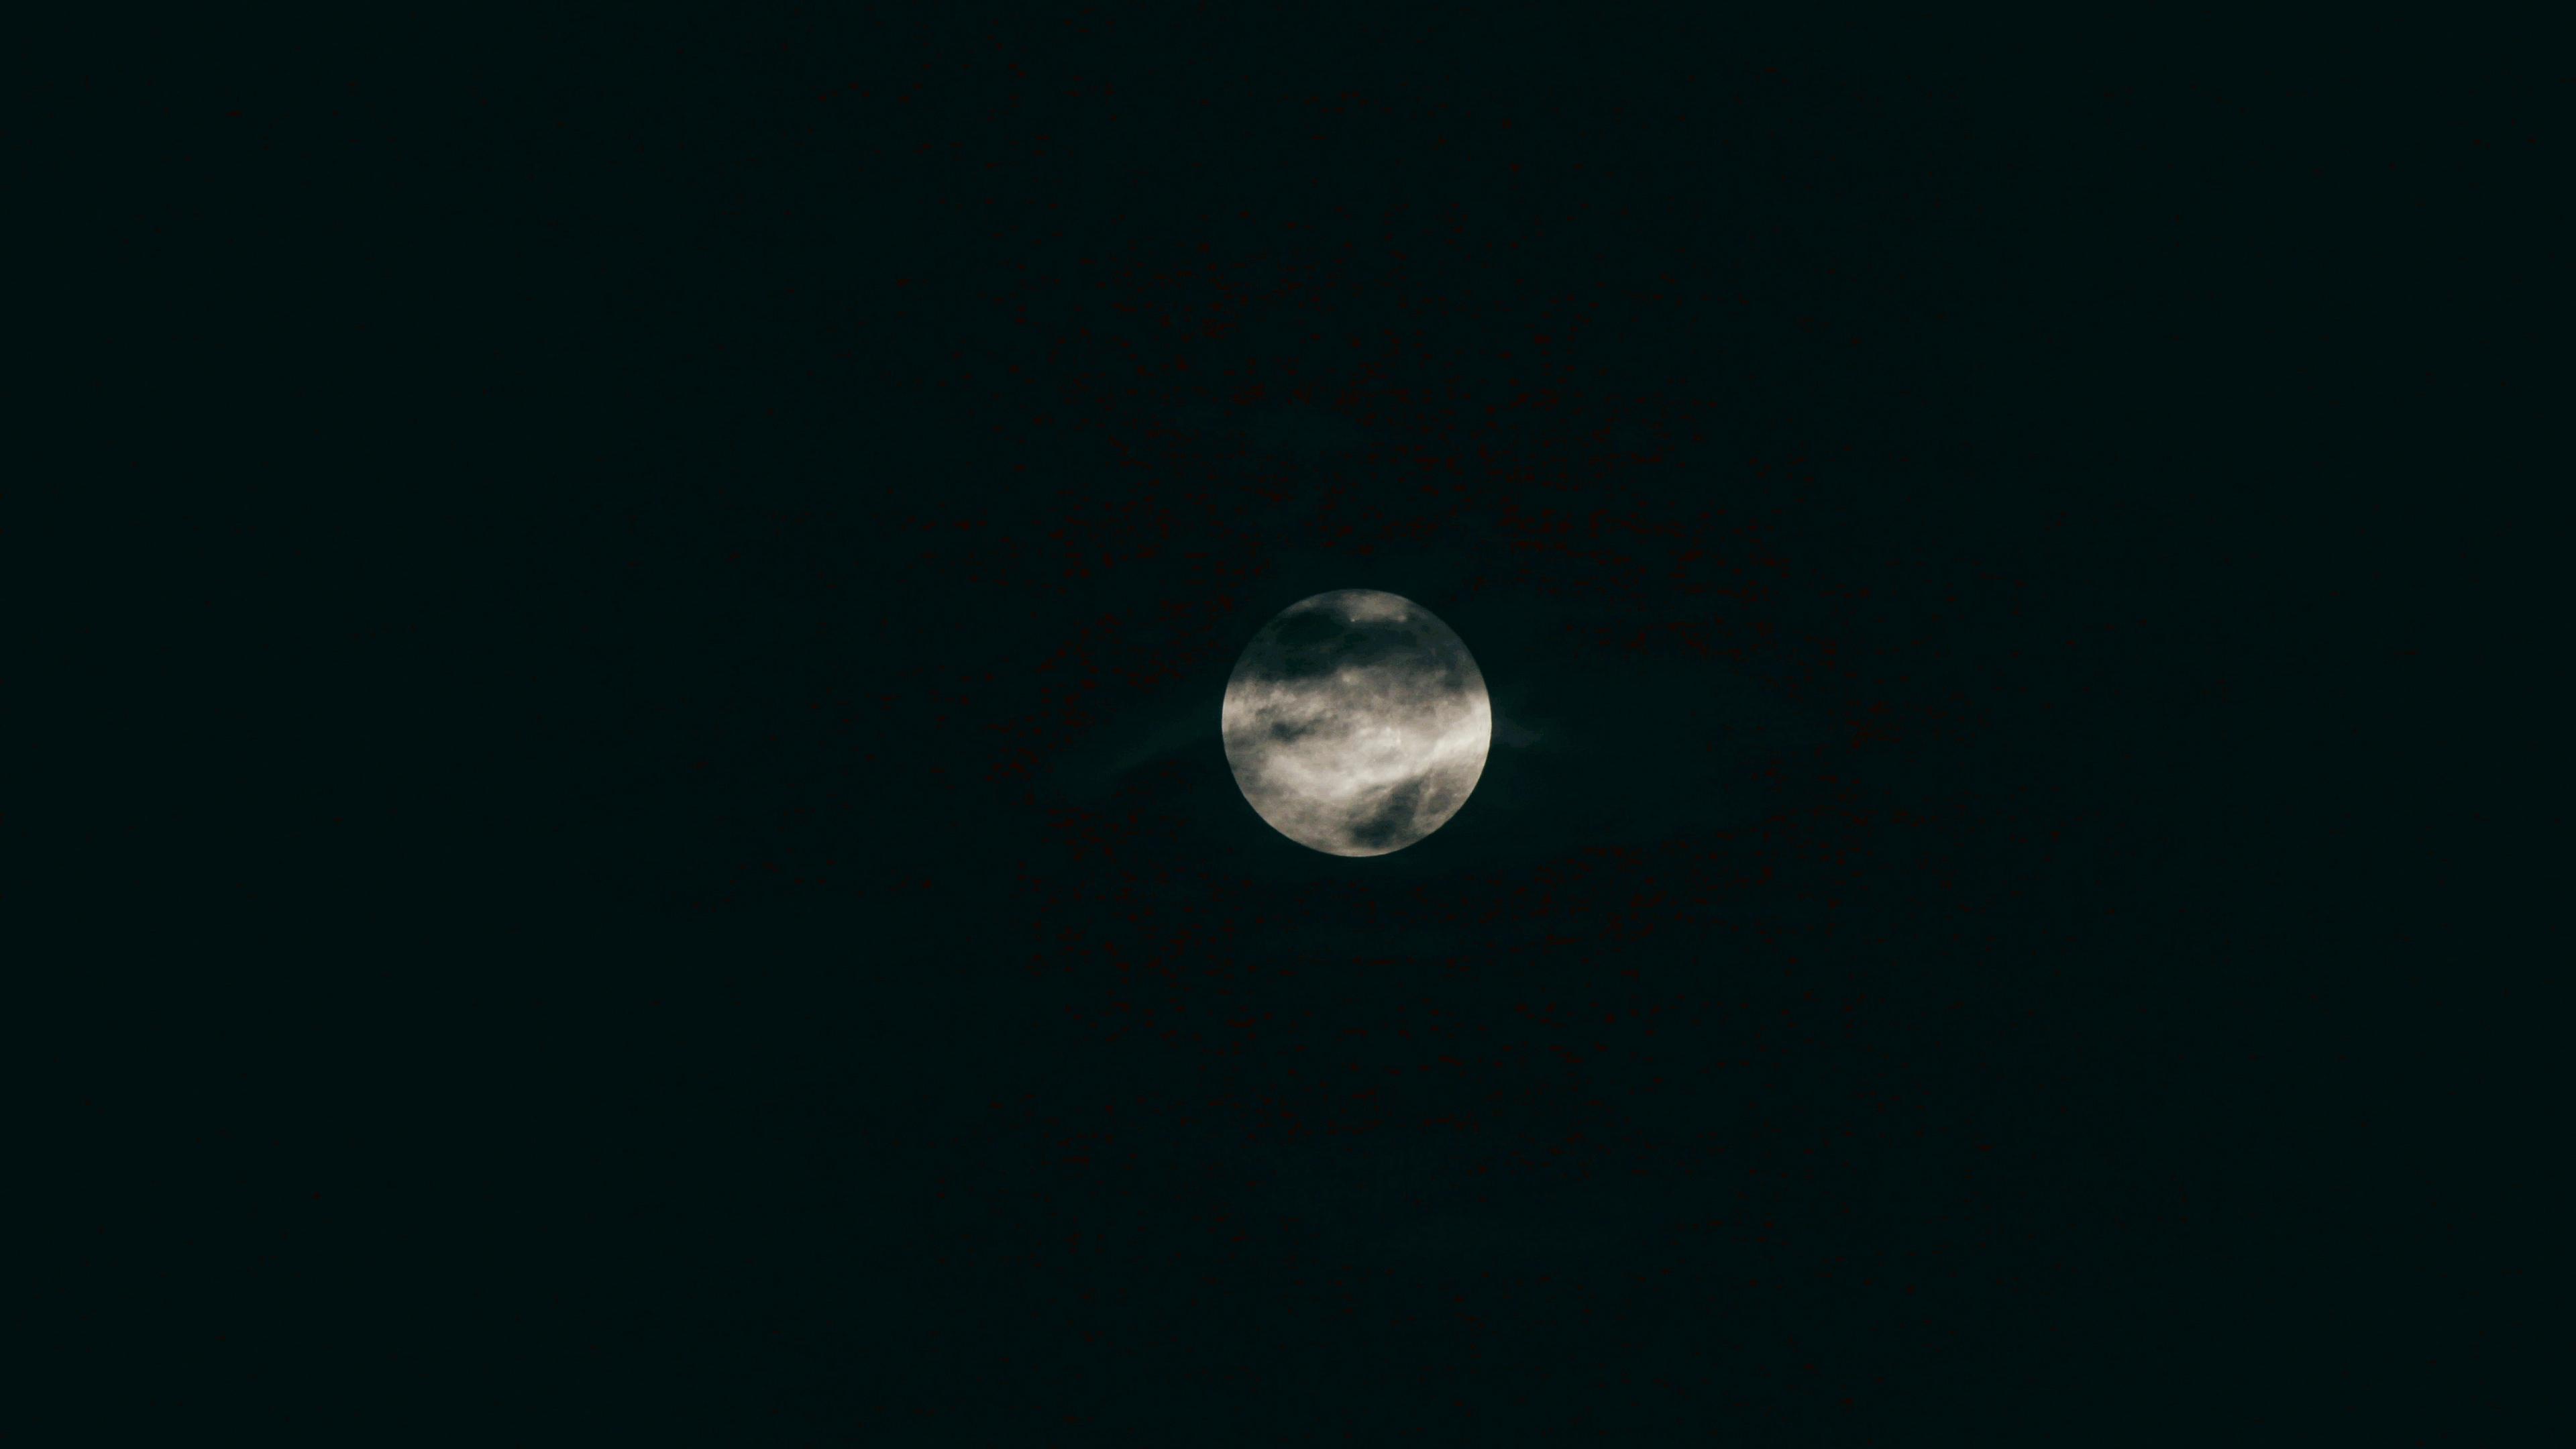 moon full moon planet 4k 1536016909 - moon, full moon, planet 4k - Planet, Moon, full moon